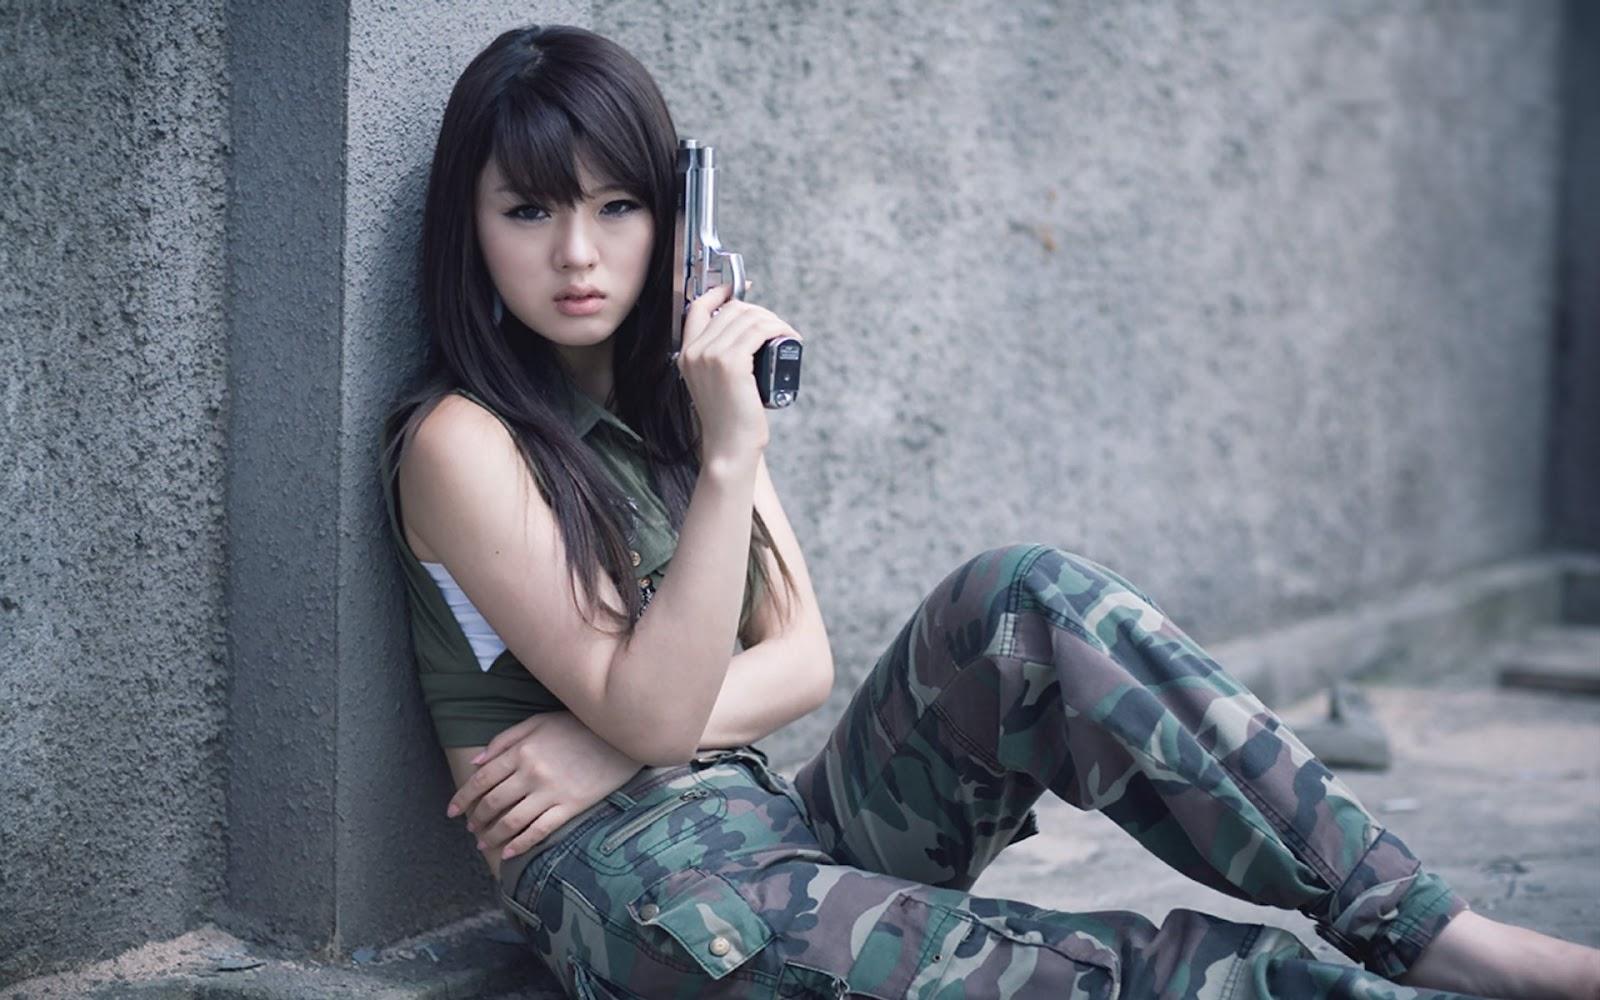 Car Girl Wallpaper Desktop Desktop Wallpaper Cute Hwang Mi Hee With Gun Desktop